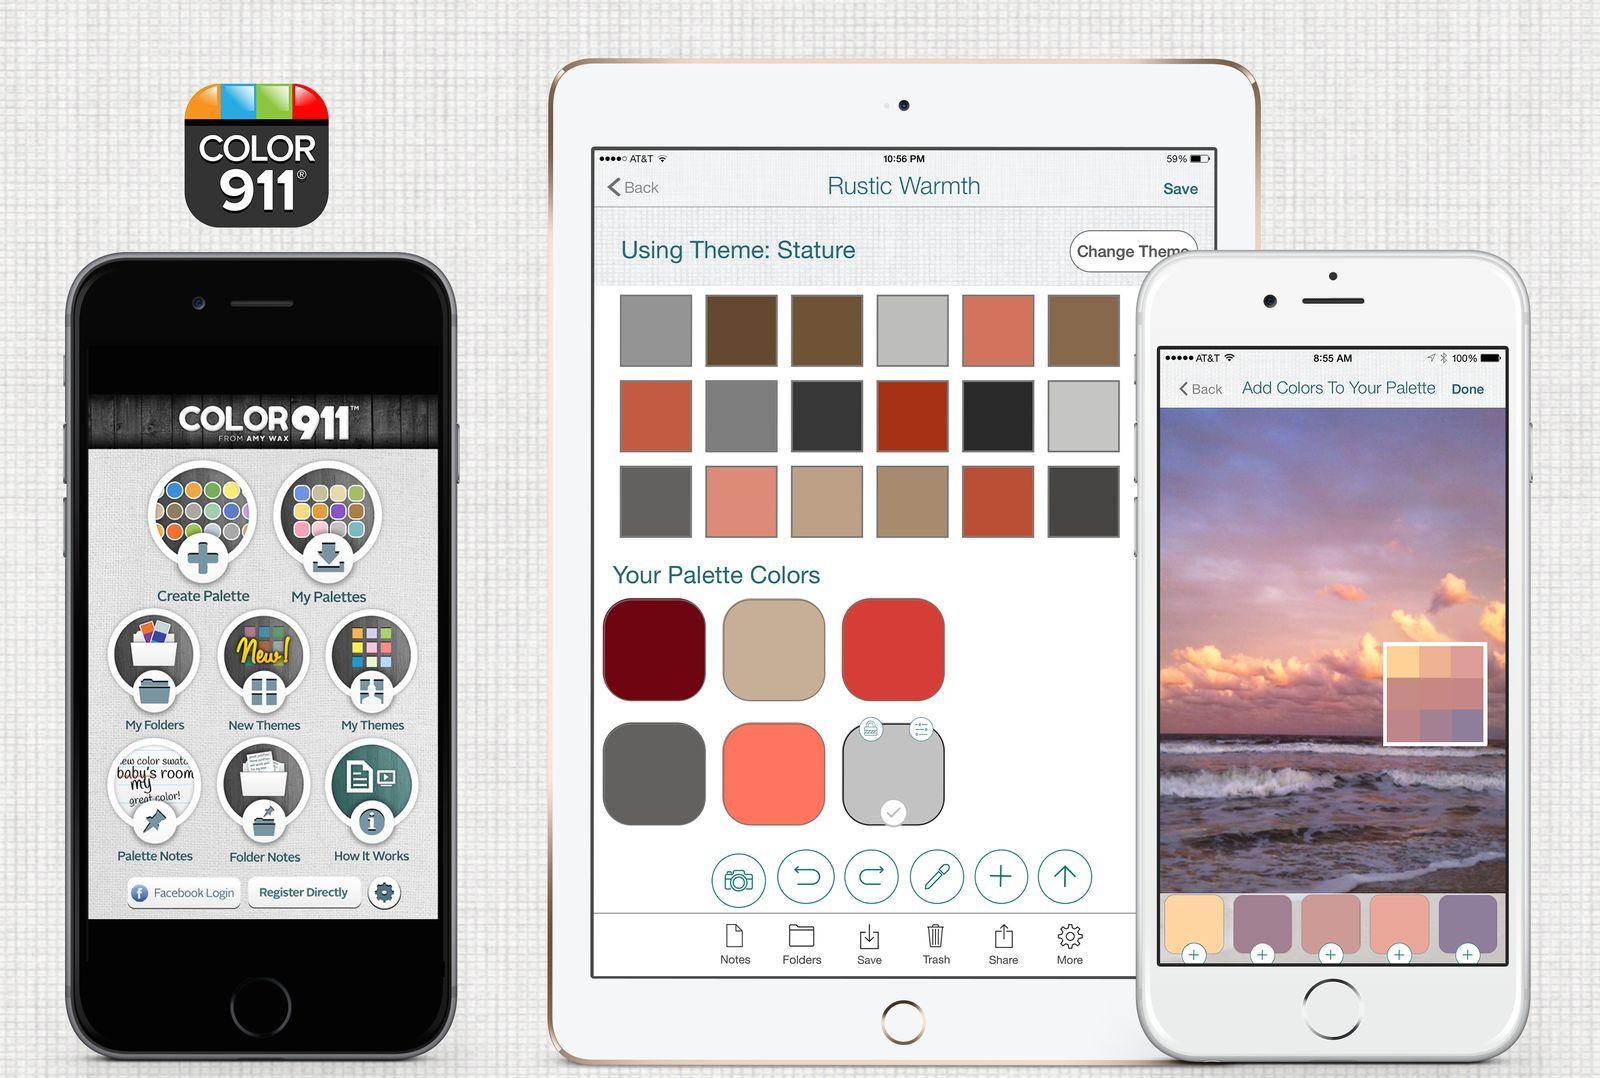 These Interior Design Apps Will Revolutionize Your Next